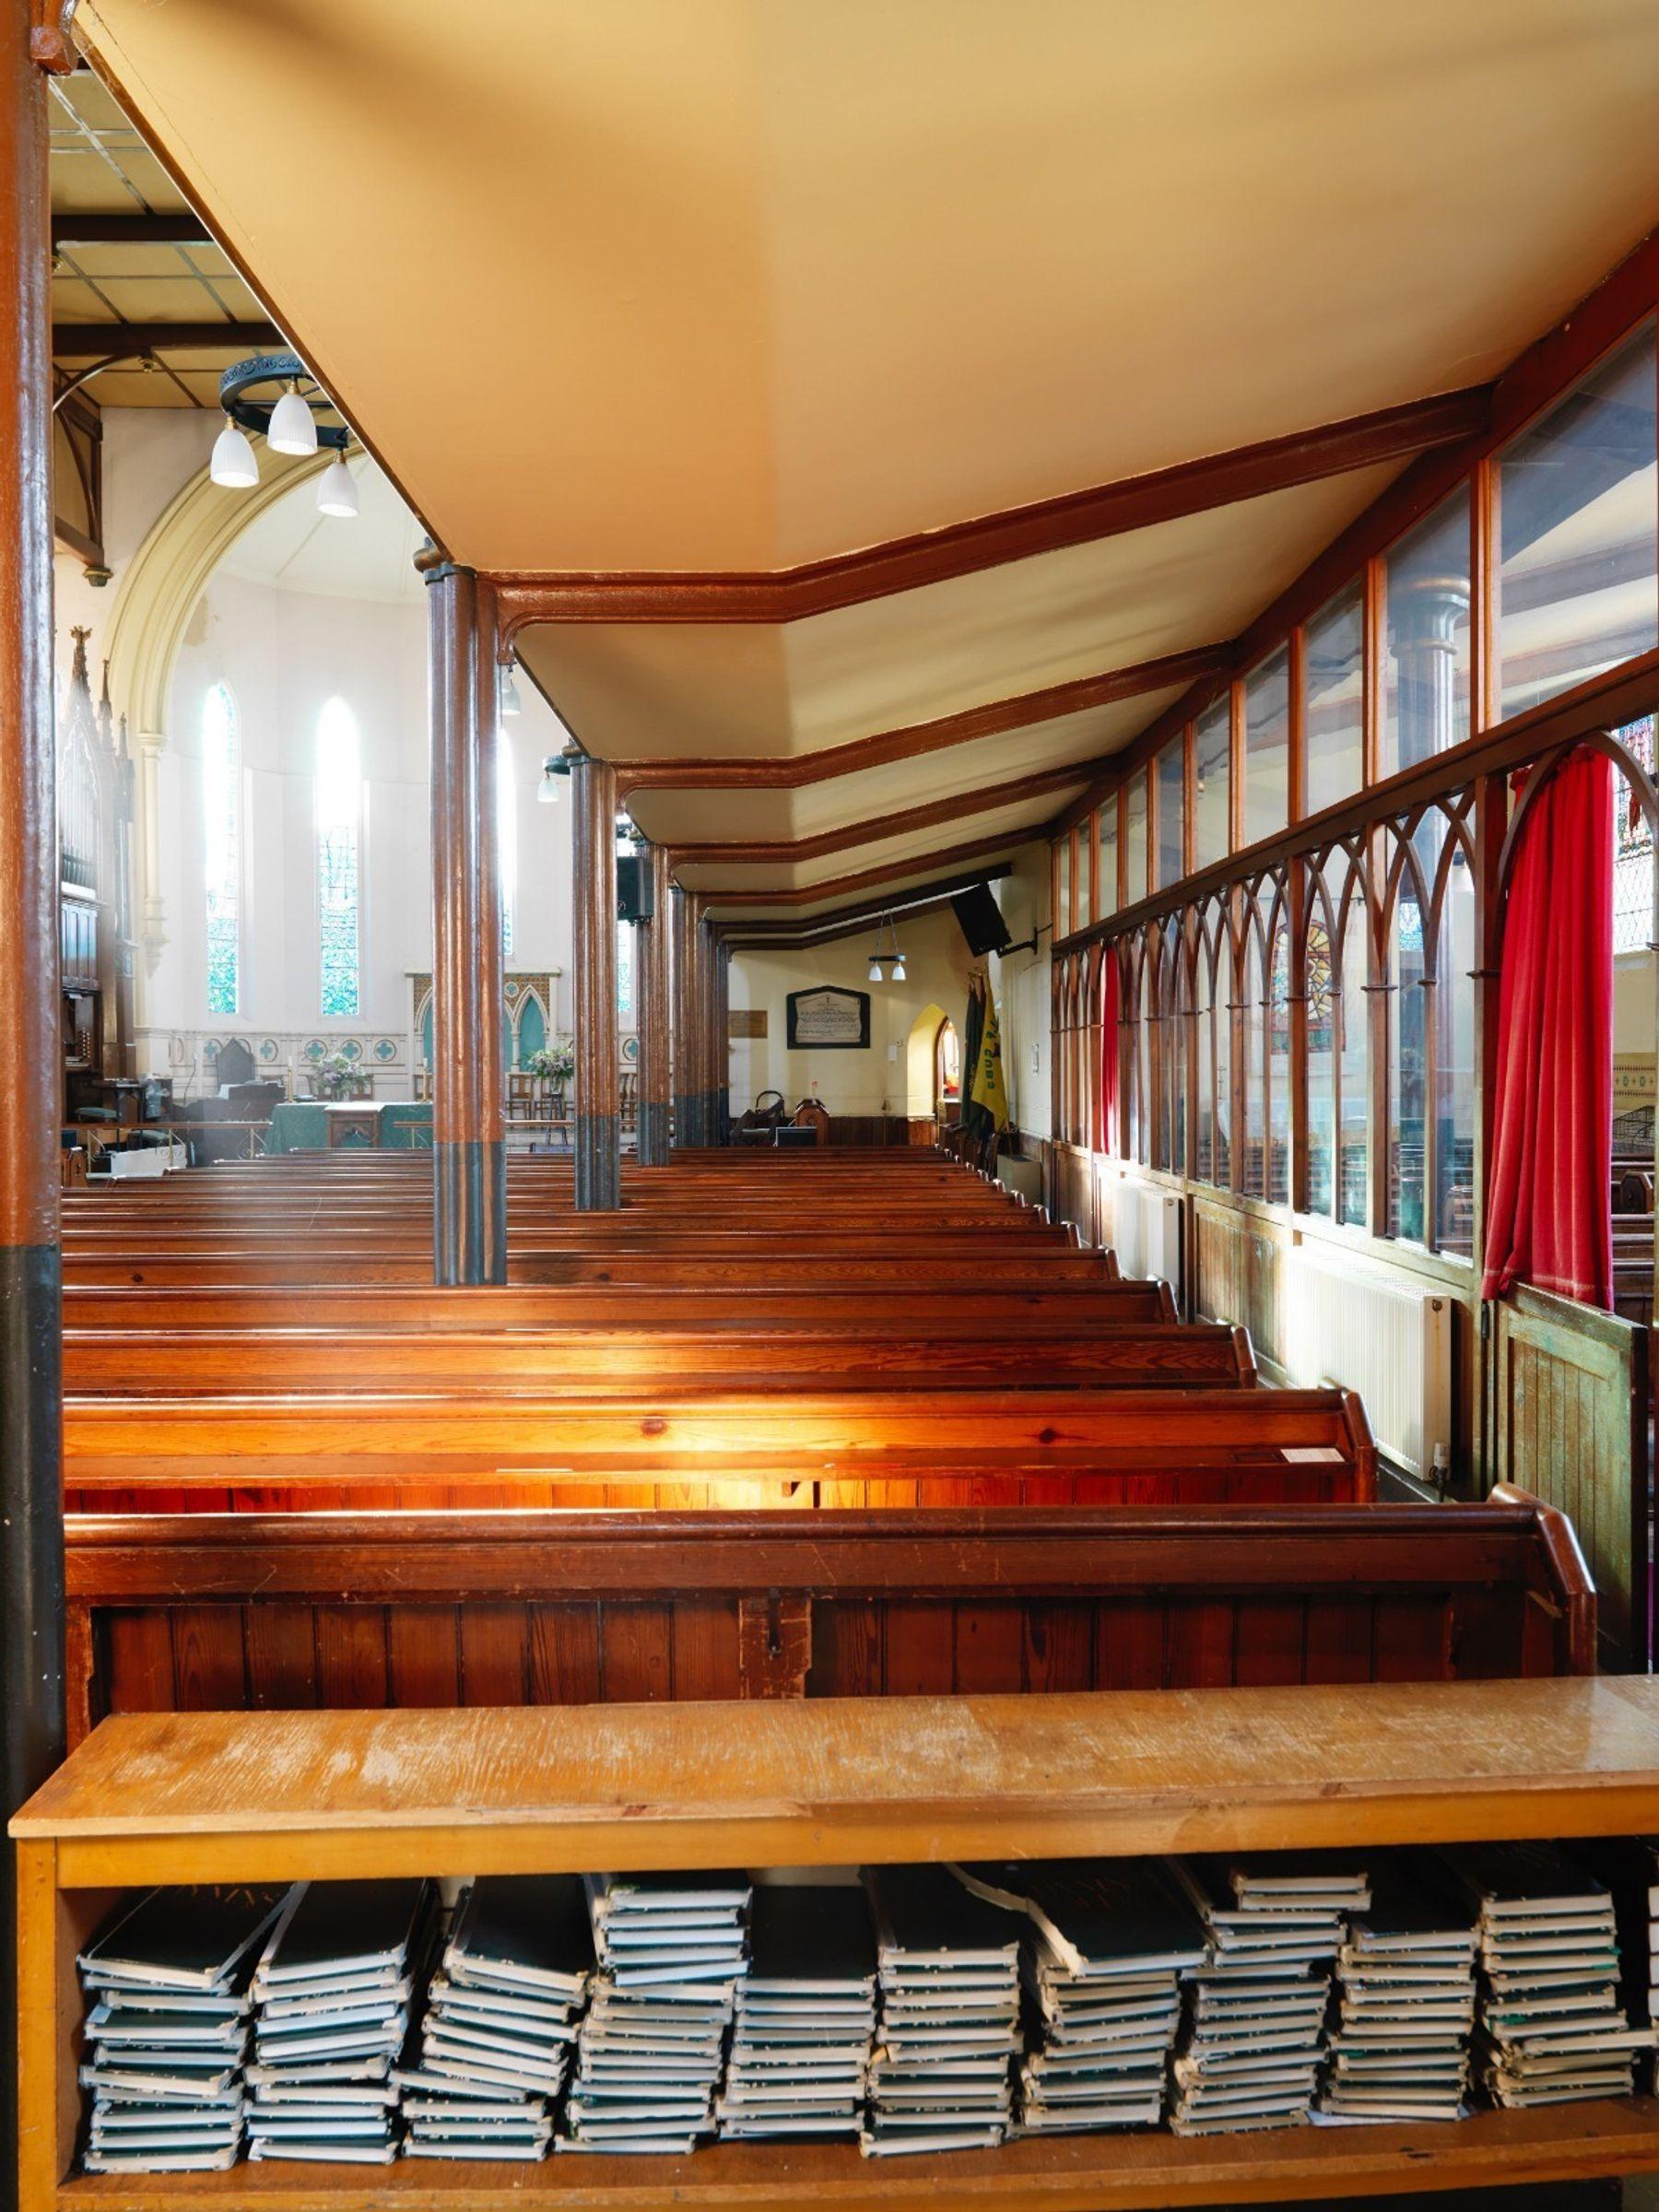 Heated church hall with lovely acoustics